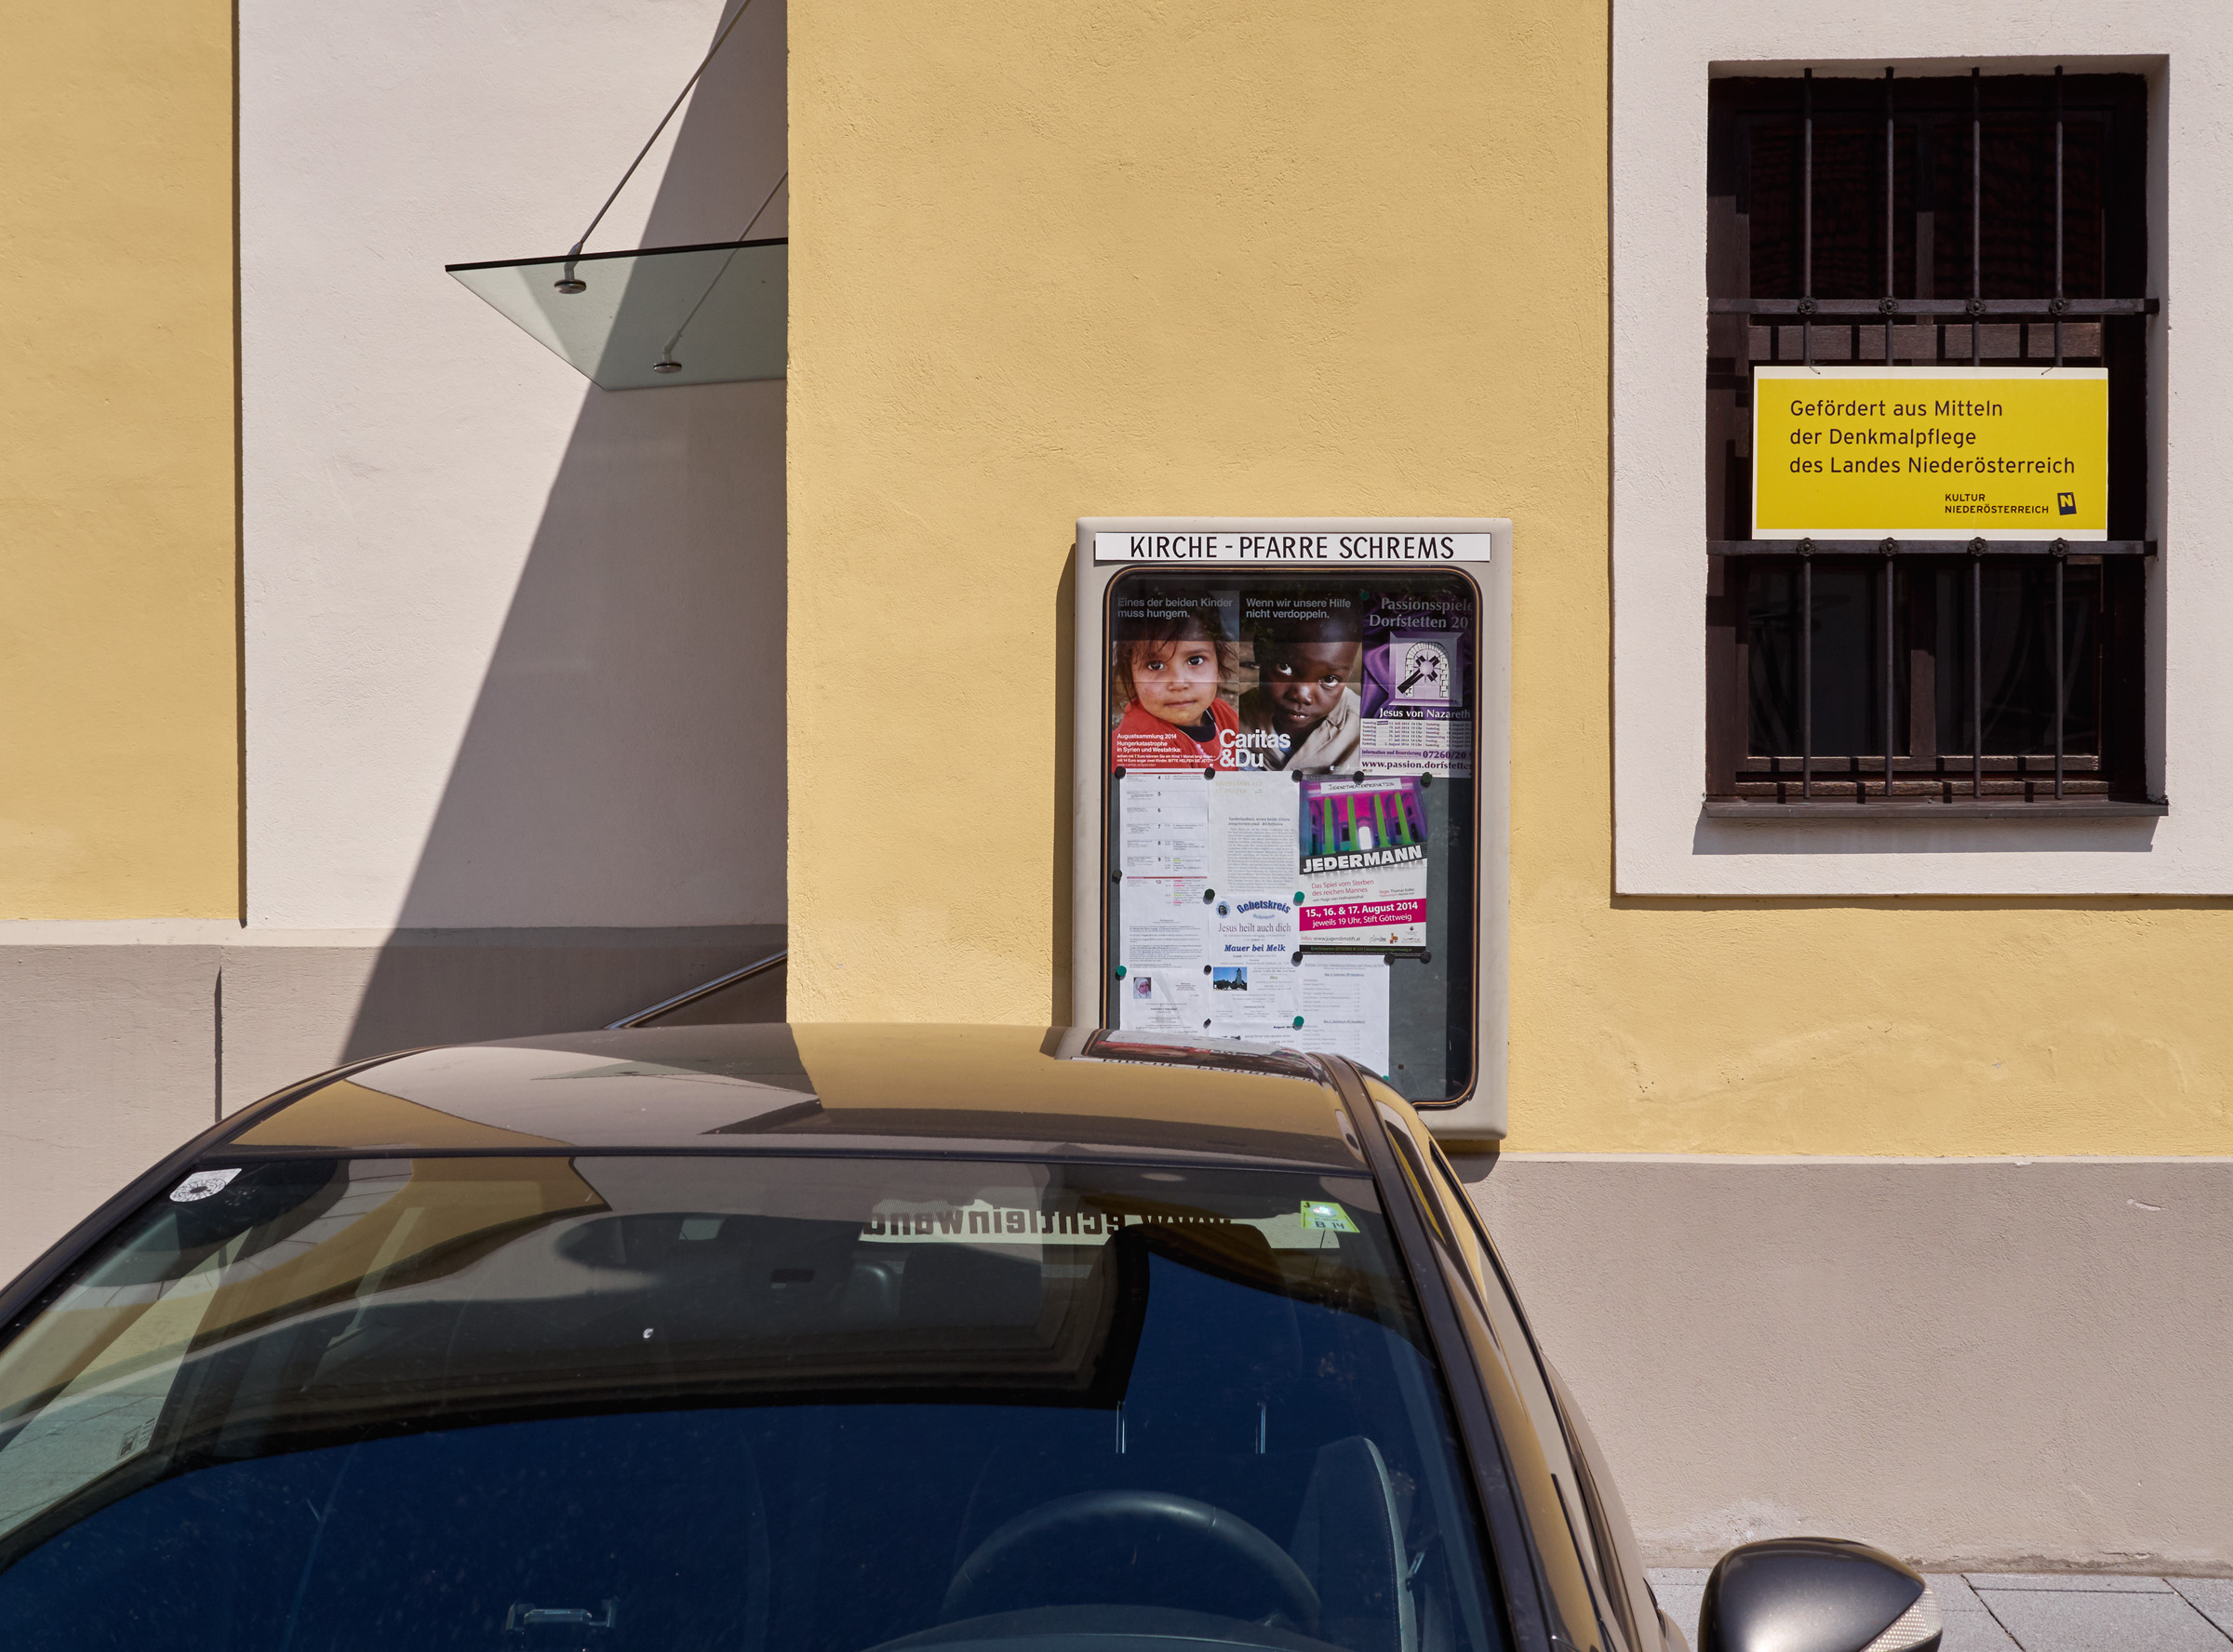 Schrems Kirche weit 2014-08-03.jpg